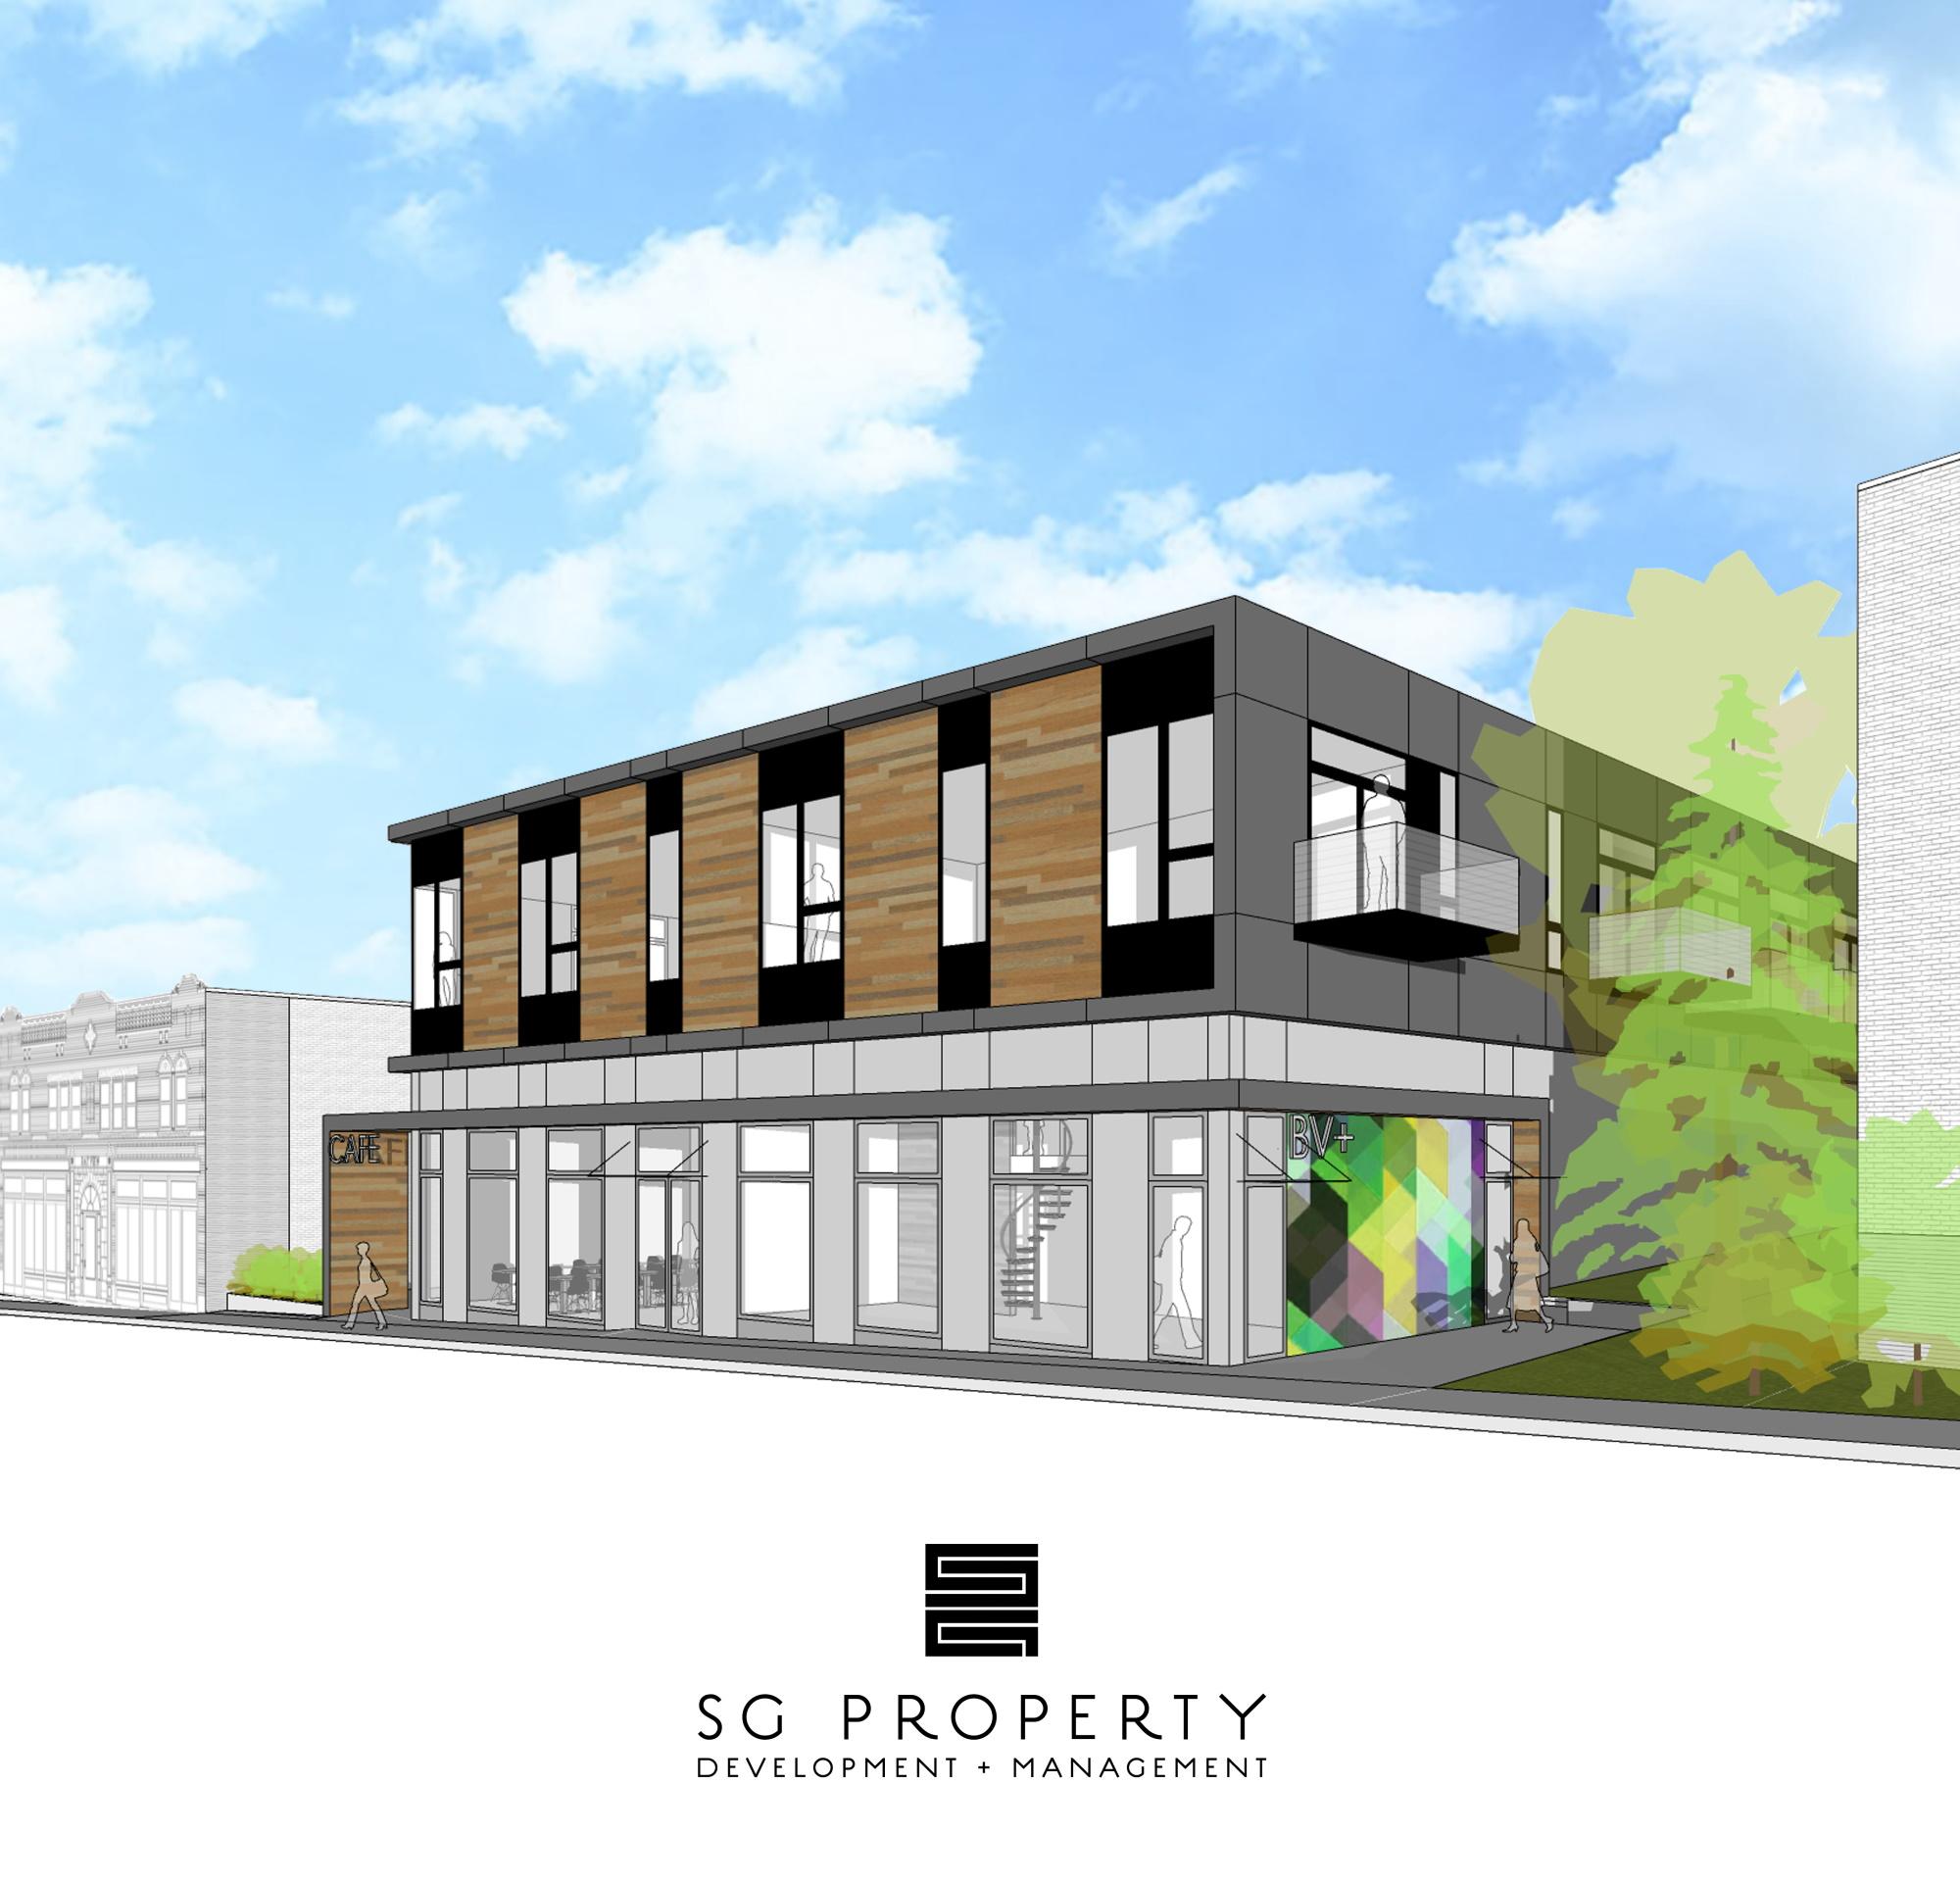 BV+ rendering. Rendering by SG Property Development + Management.